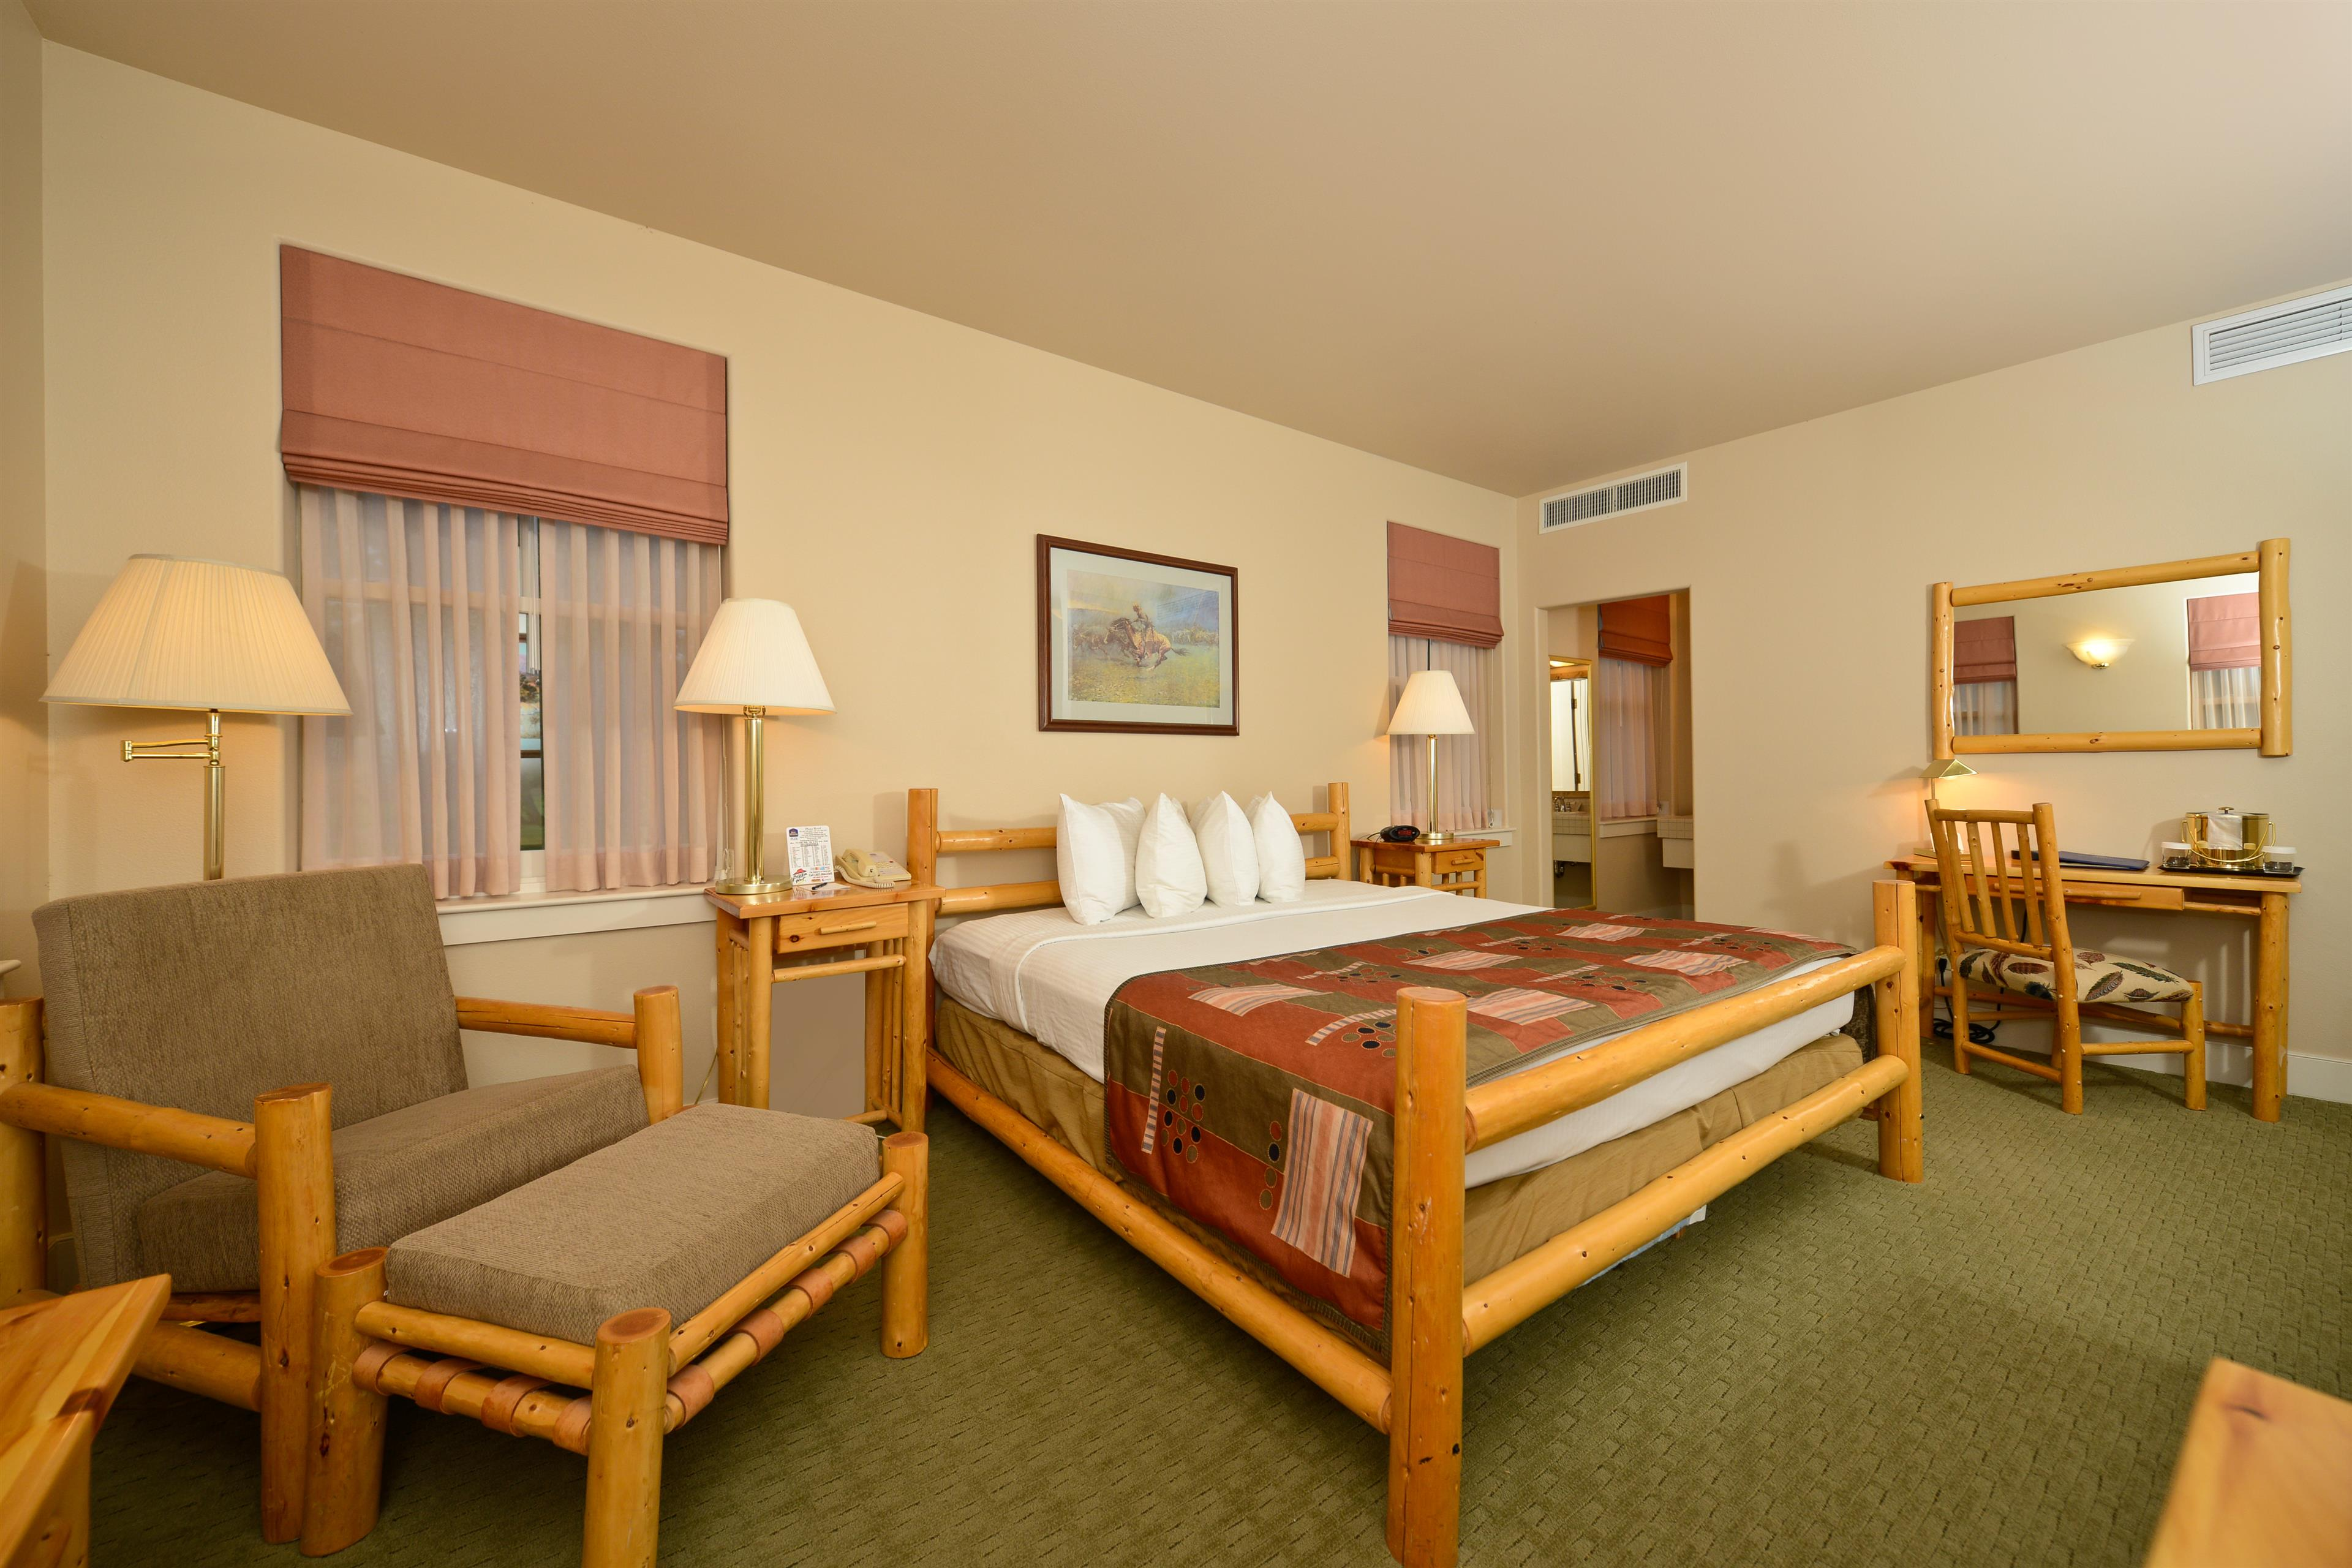 Best Western Plus Plaza Hotel image 35